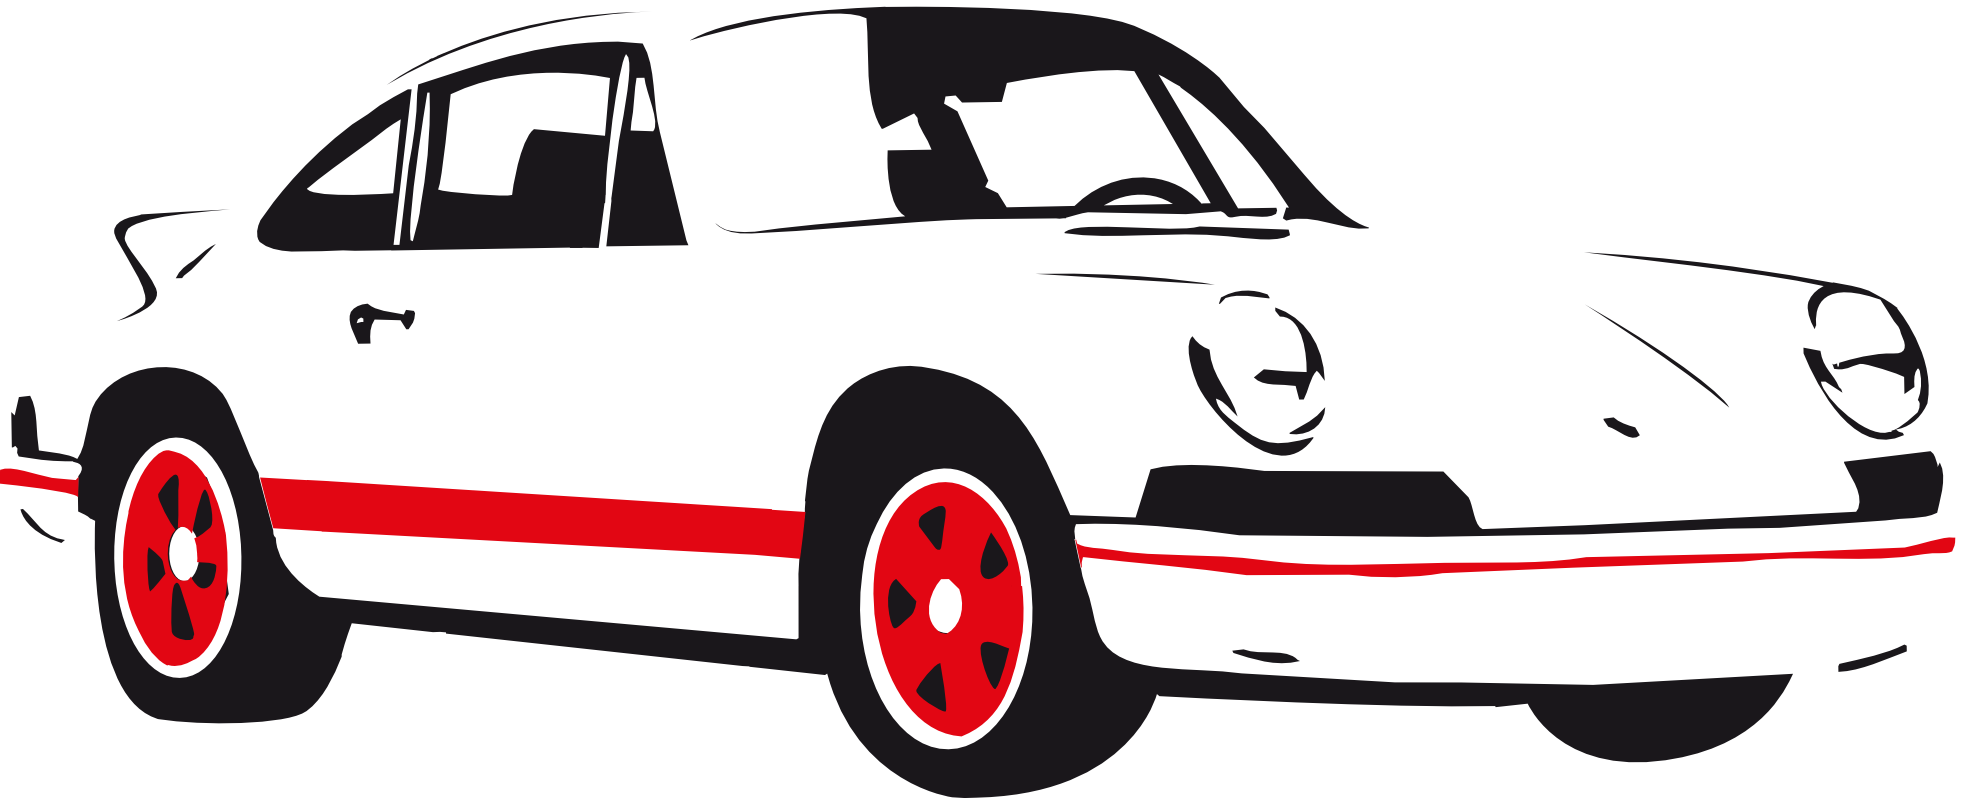 1969x798 Race Car Clipart Sports Car